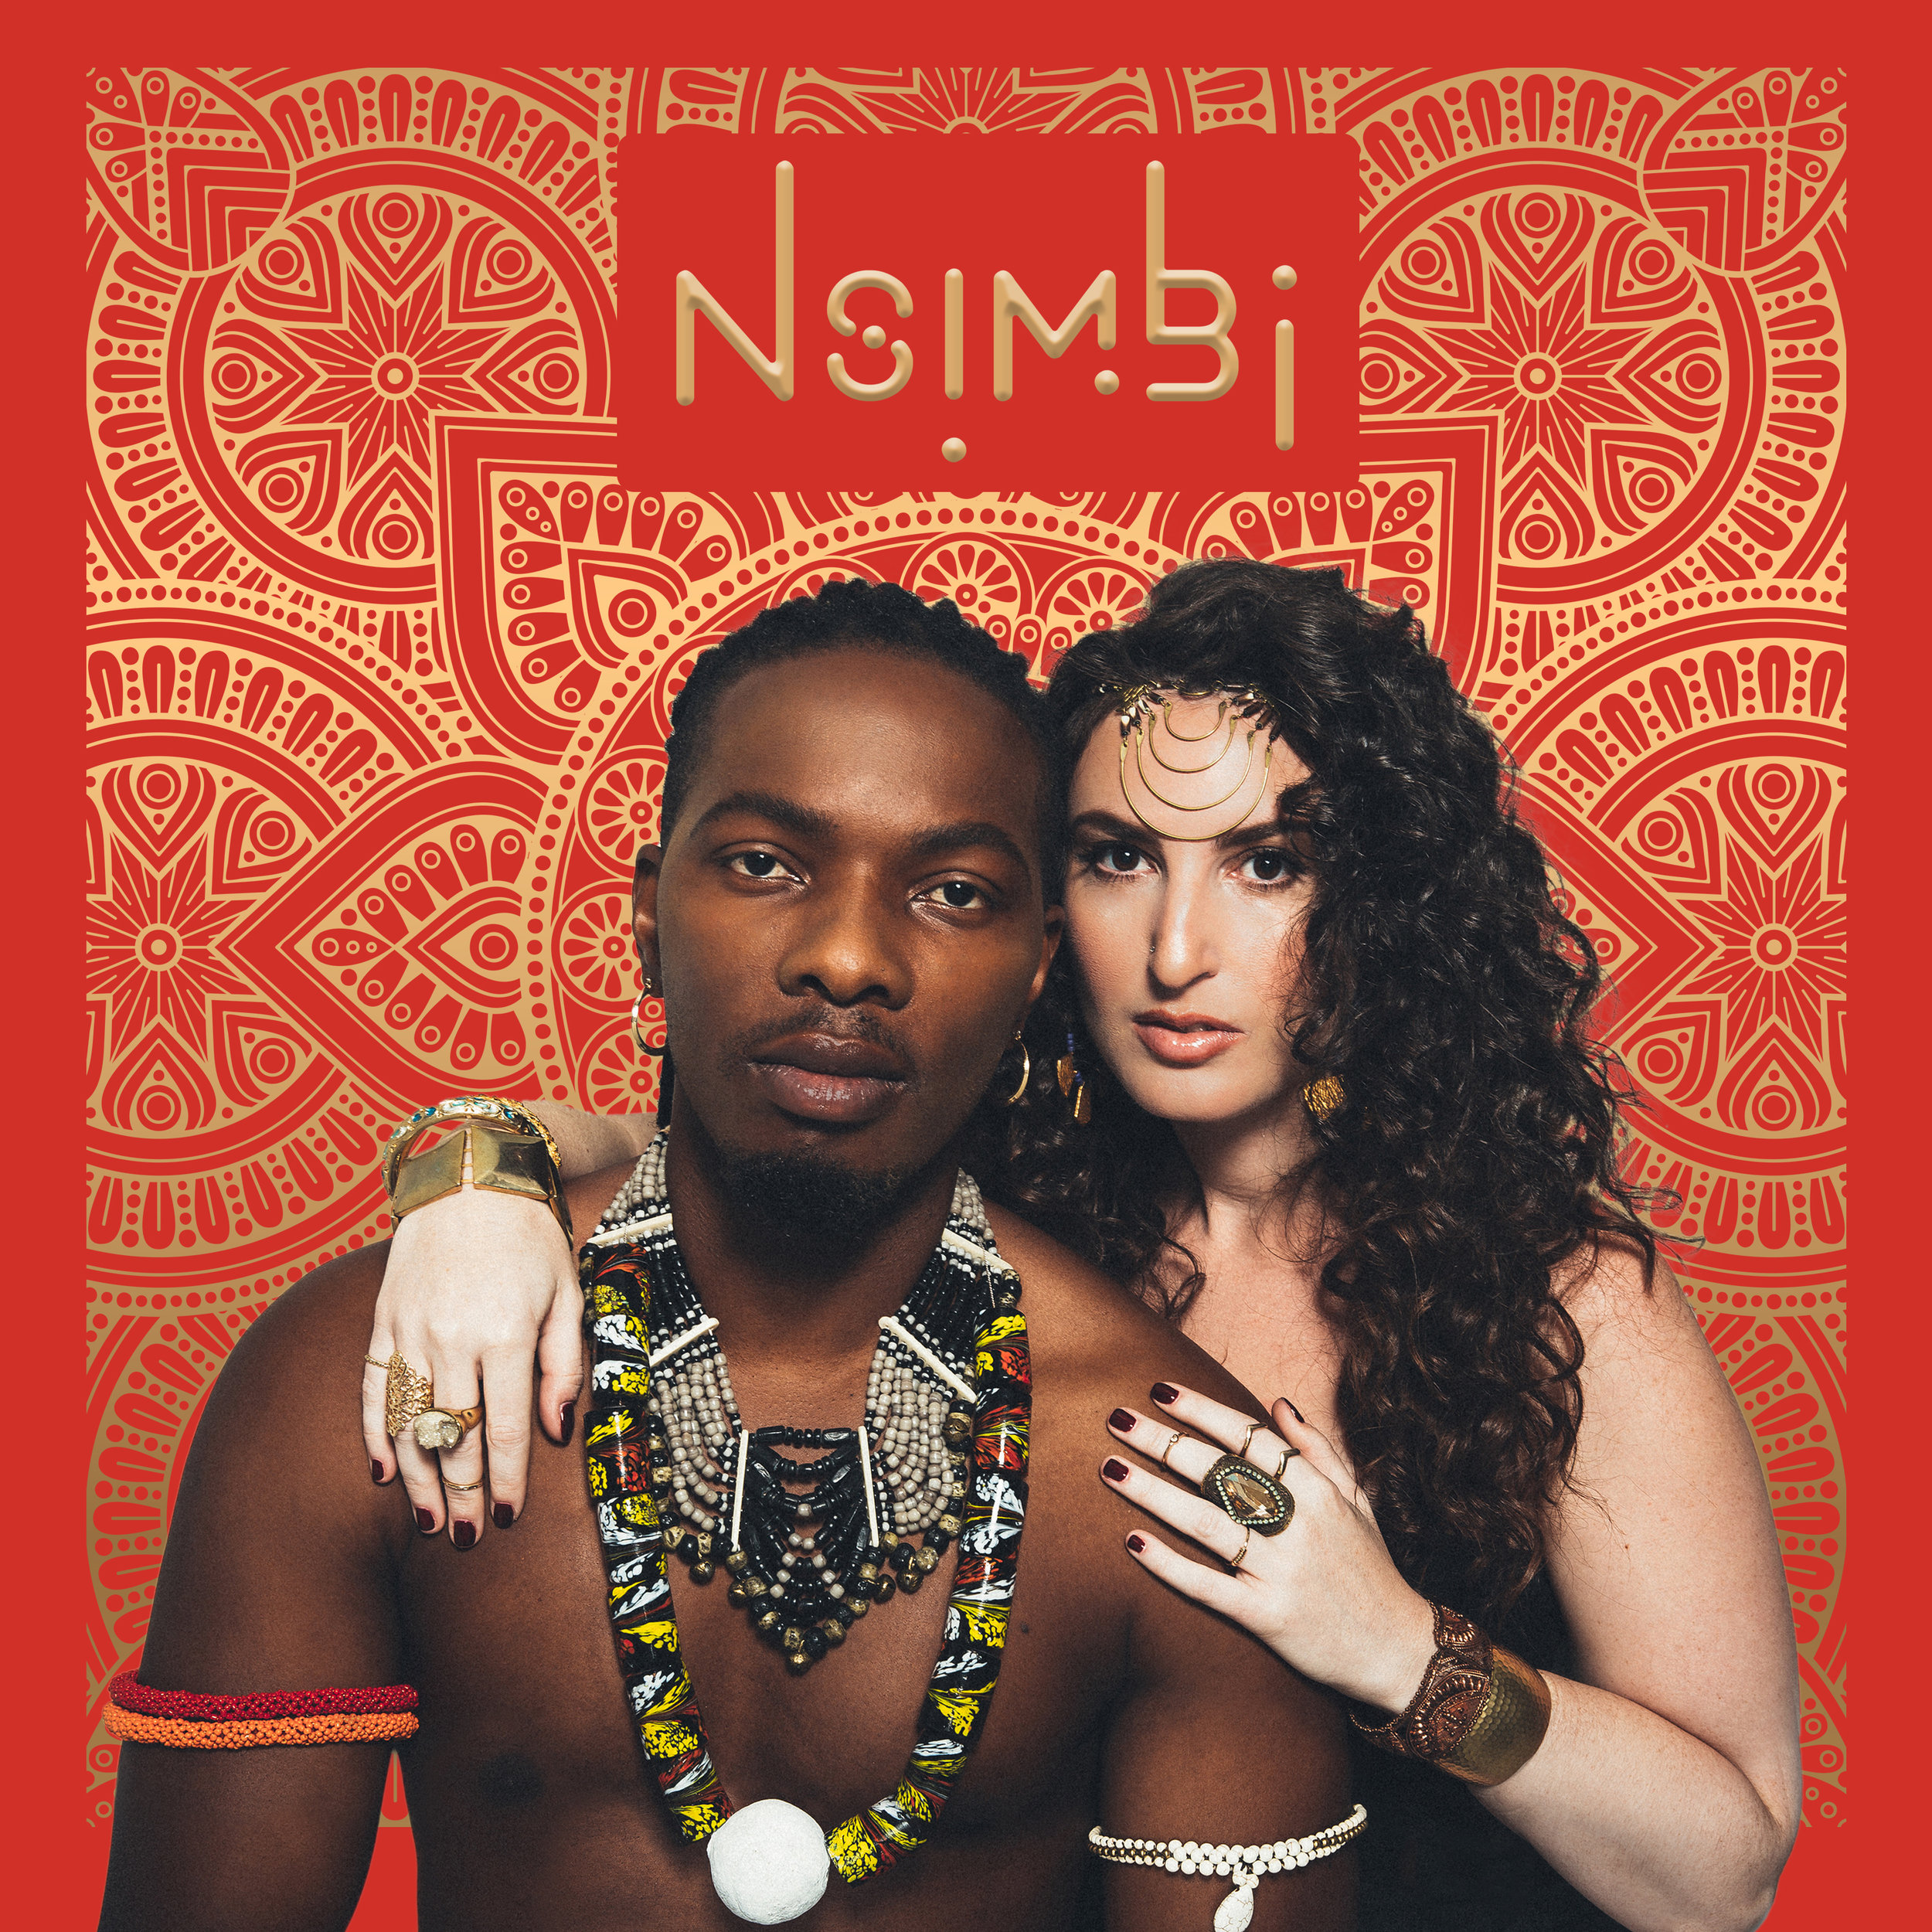 NSIMBI ALBUM ART.jpg